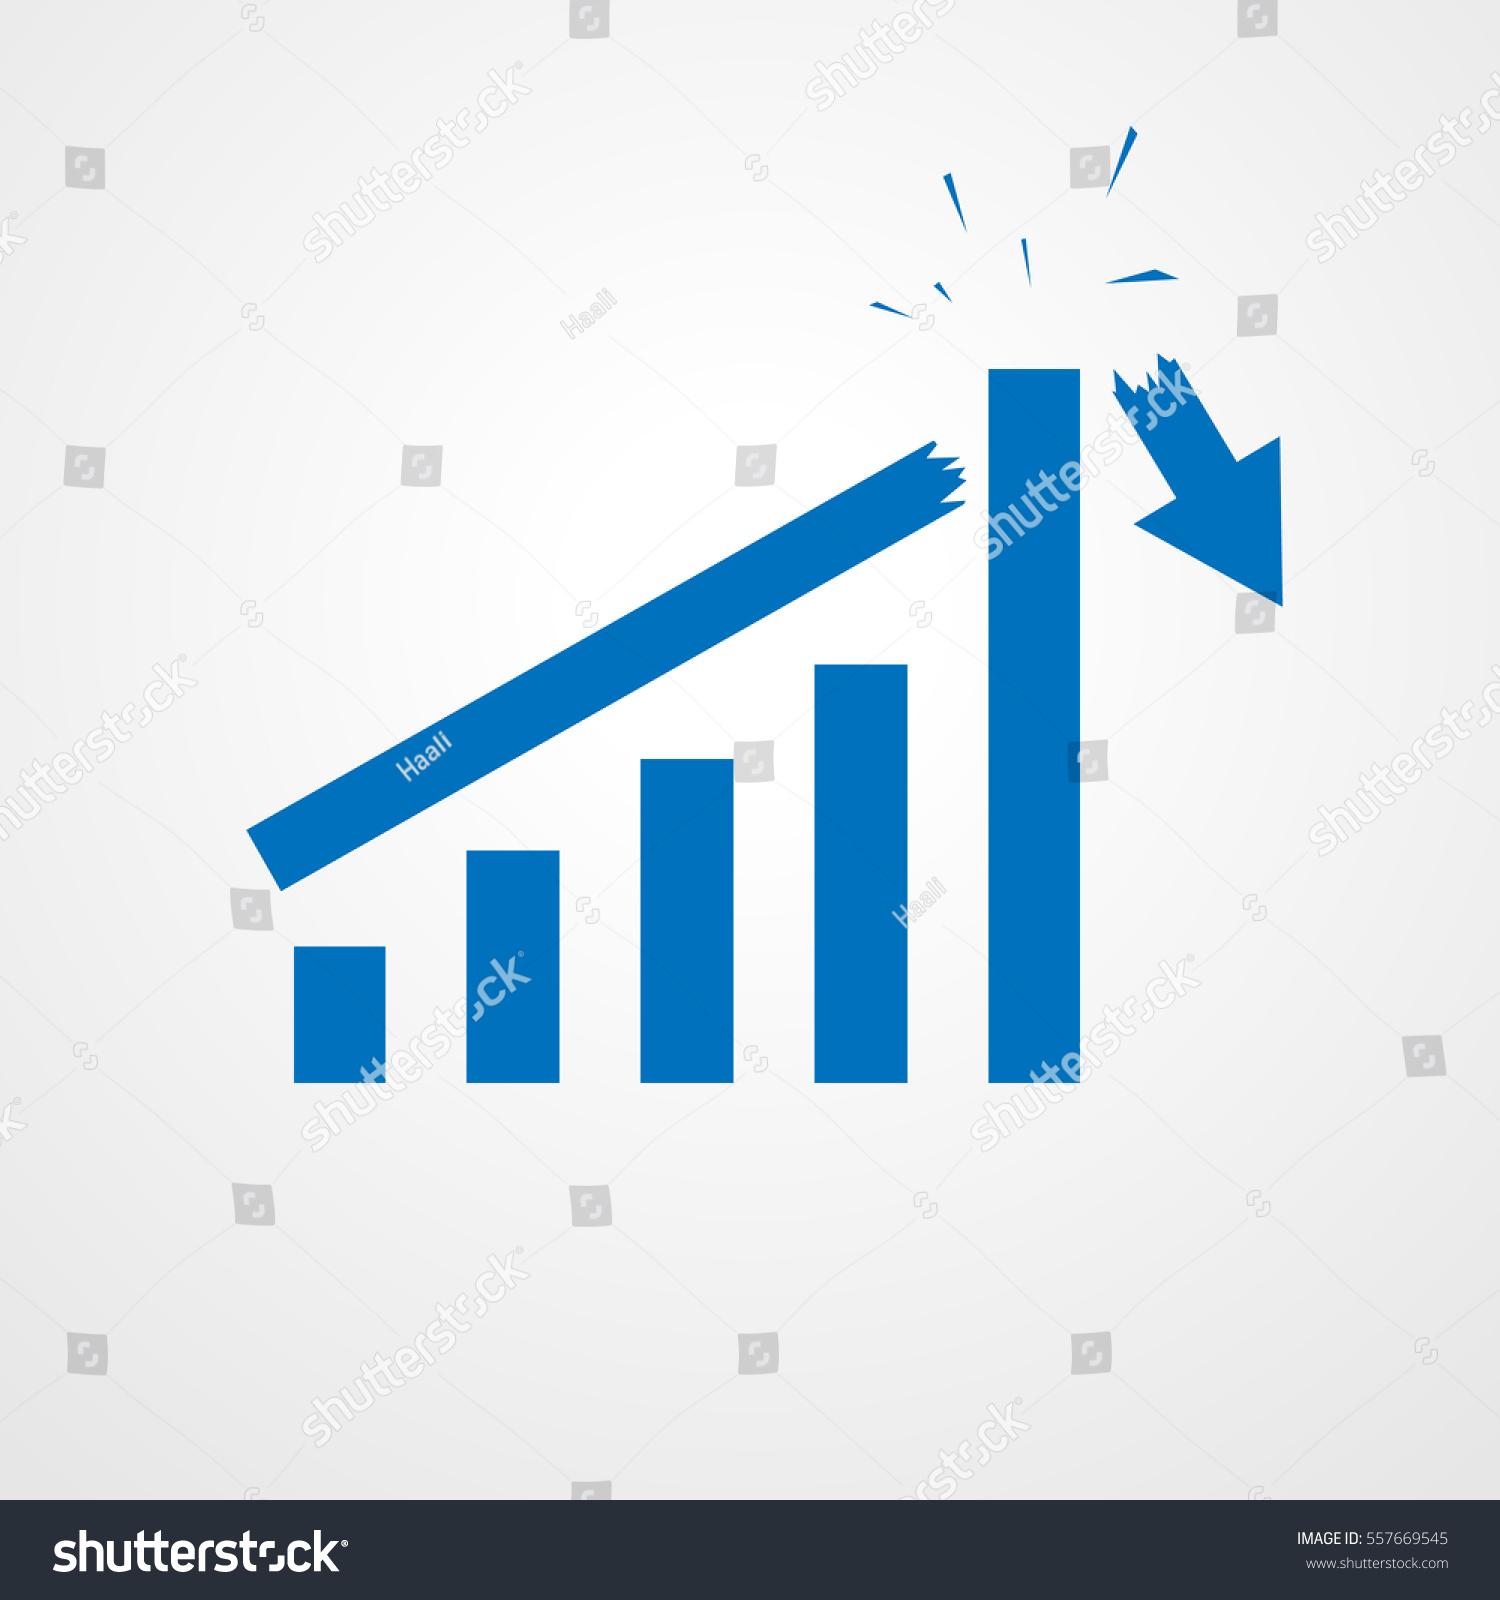 Growing bar graph icon rising arrow stock vector 557669545 growing bar graph icon with rising arrow financial forecast graph blue graph icon buycottarizona Gallery